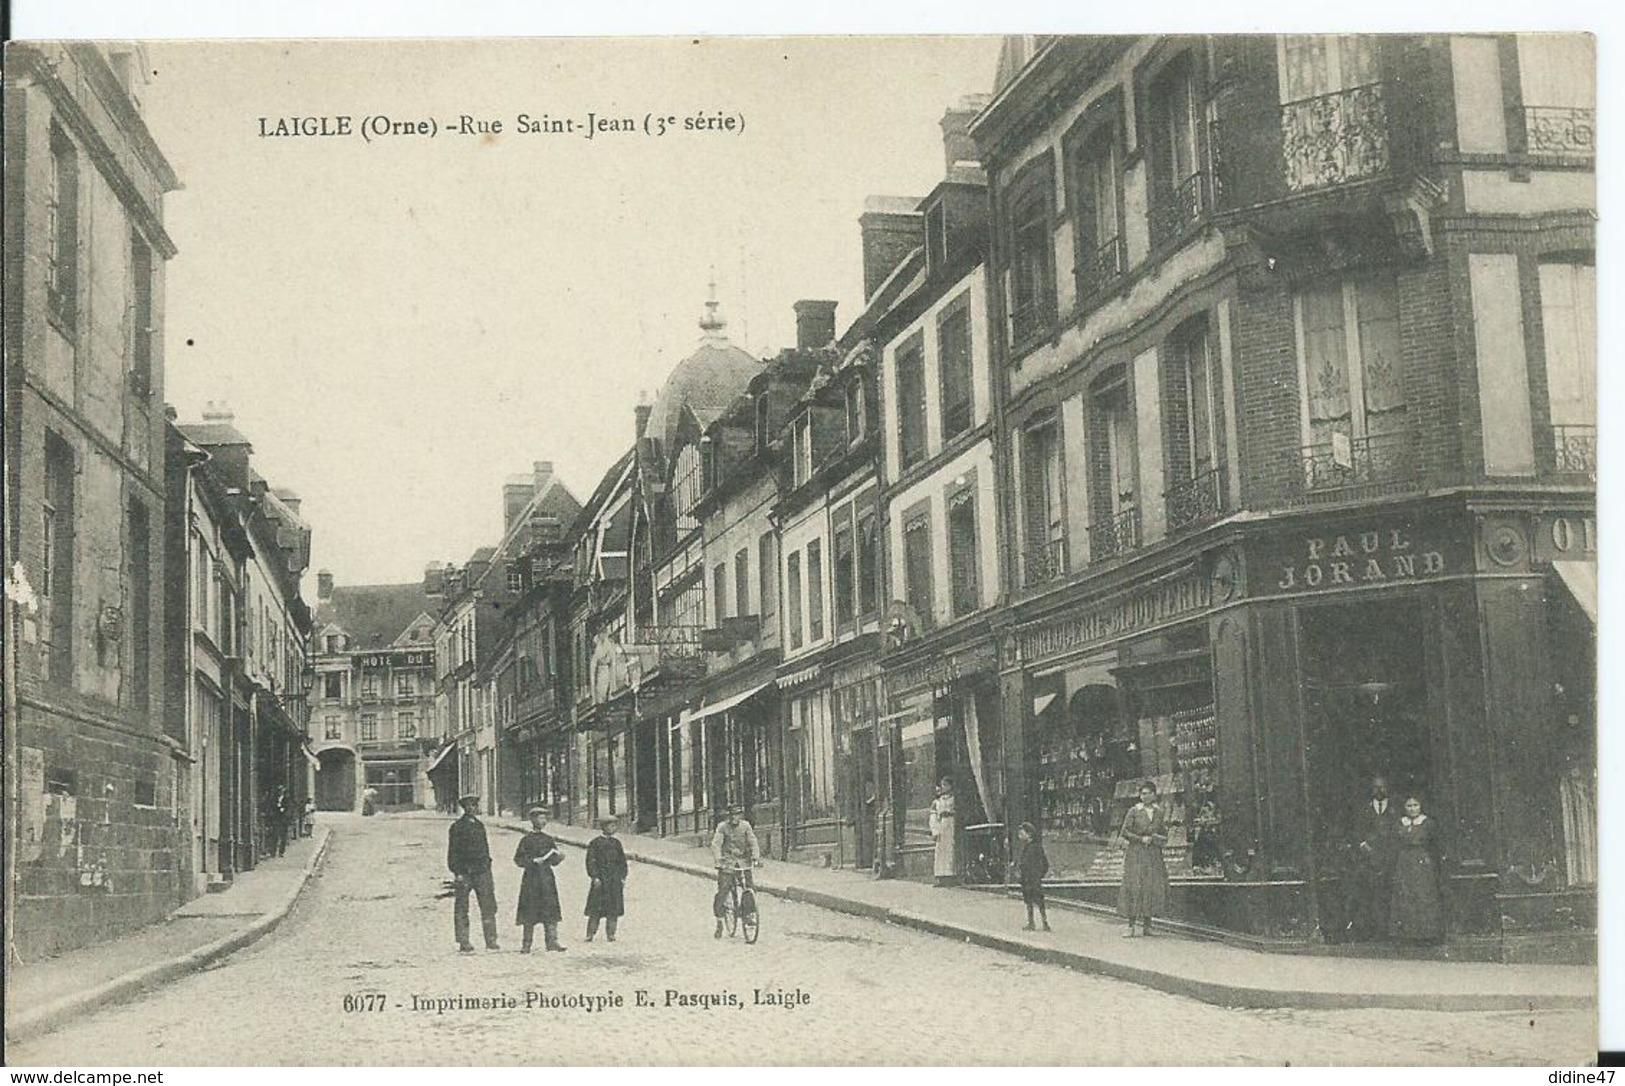 LAIGLE - Rue Saint Jean - L'Aigle